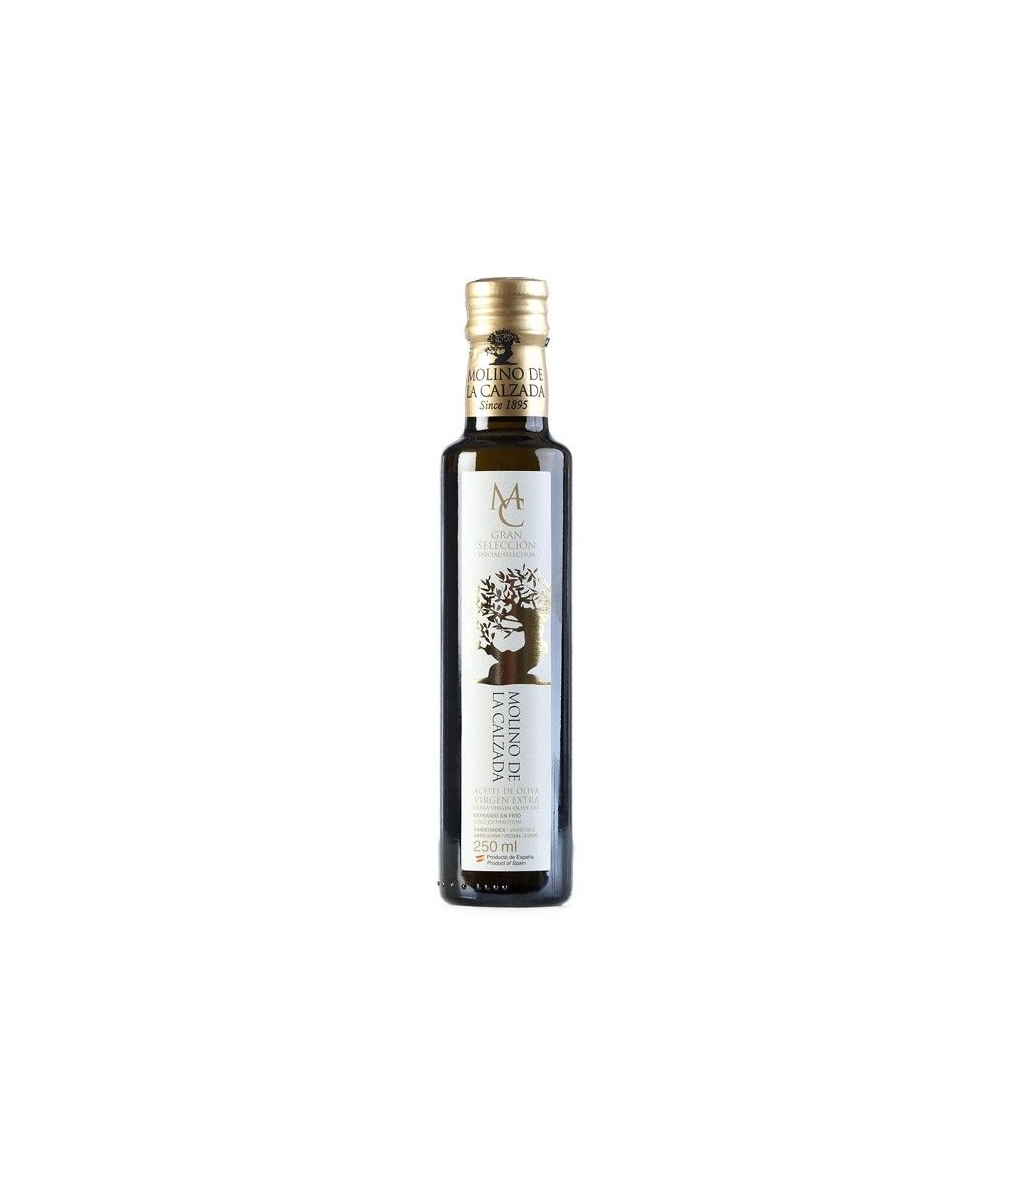 Molino de la calzada gran selecci n botella vidrio 250 - Botellas de vidrio para regalo ...